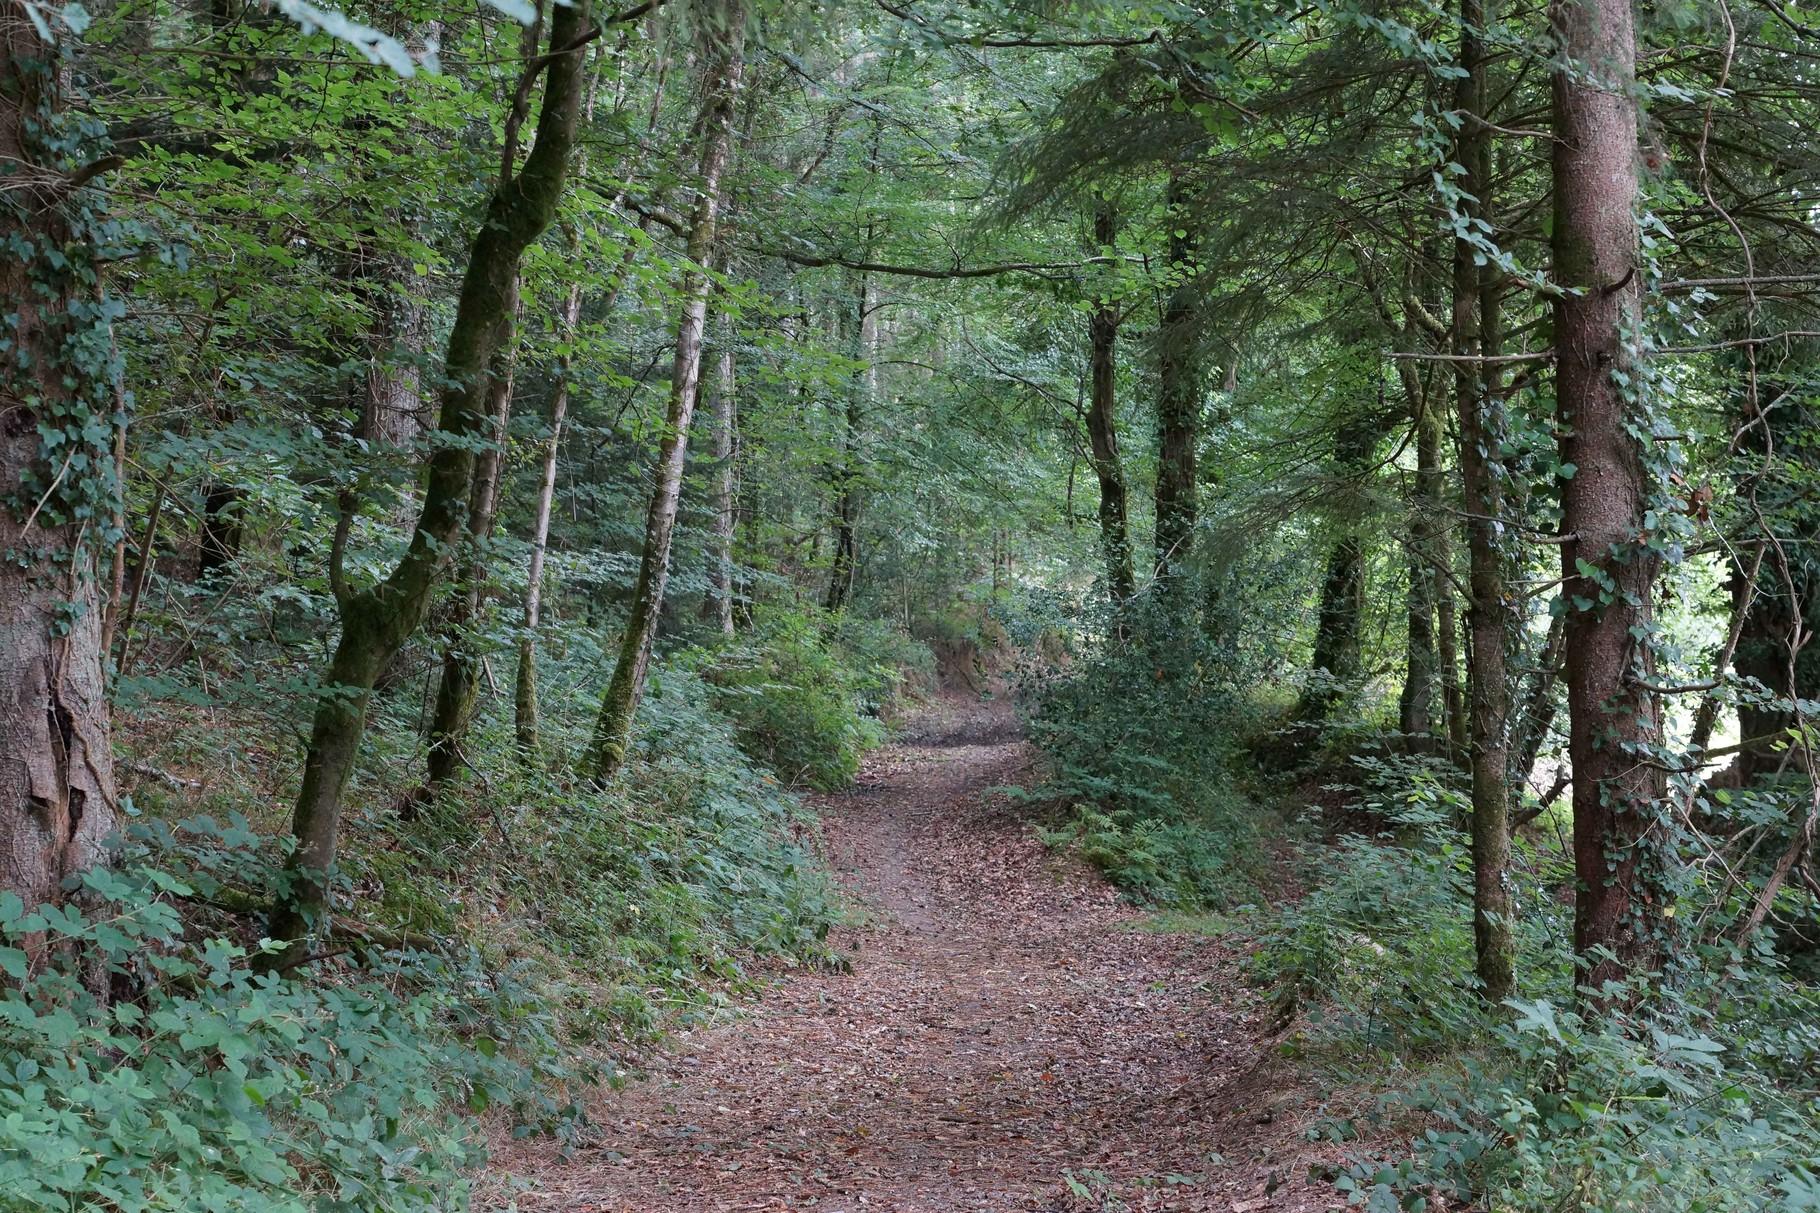 Chemin Forestier de Kerathanase, Plouégat Moysan